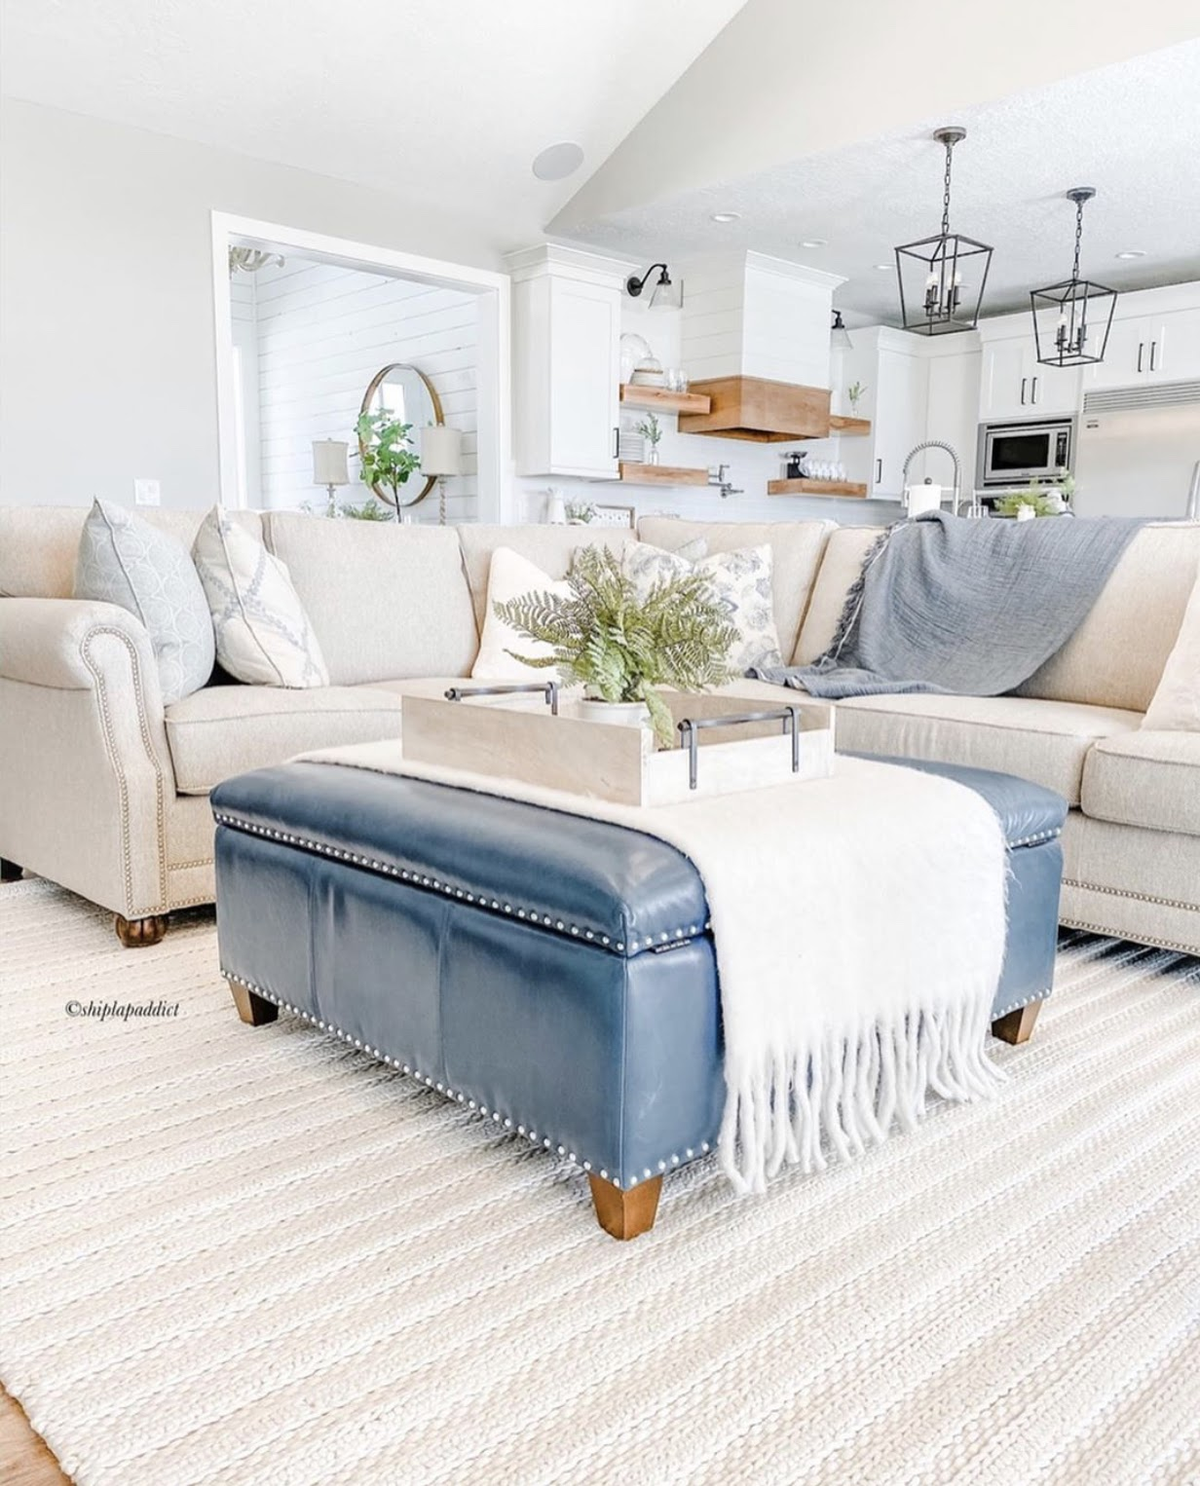 white farmhouse living room decor blue foot stool coffee table layered whites